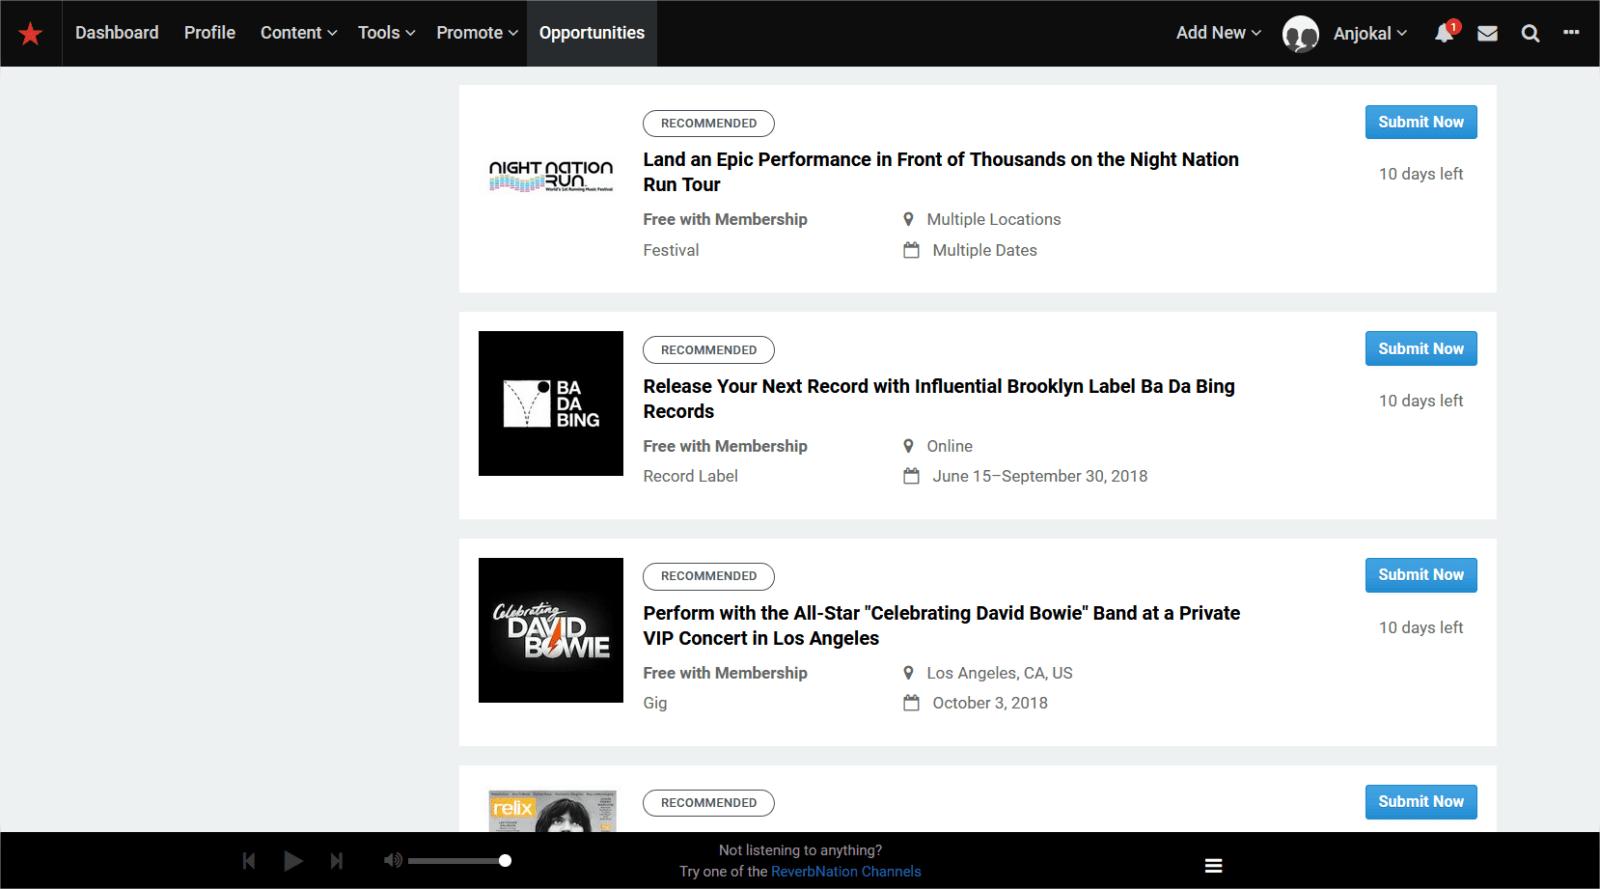 Descubra 25 sites para download de musica gratis legalmente 32